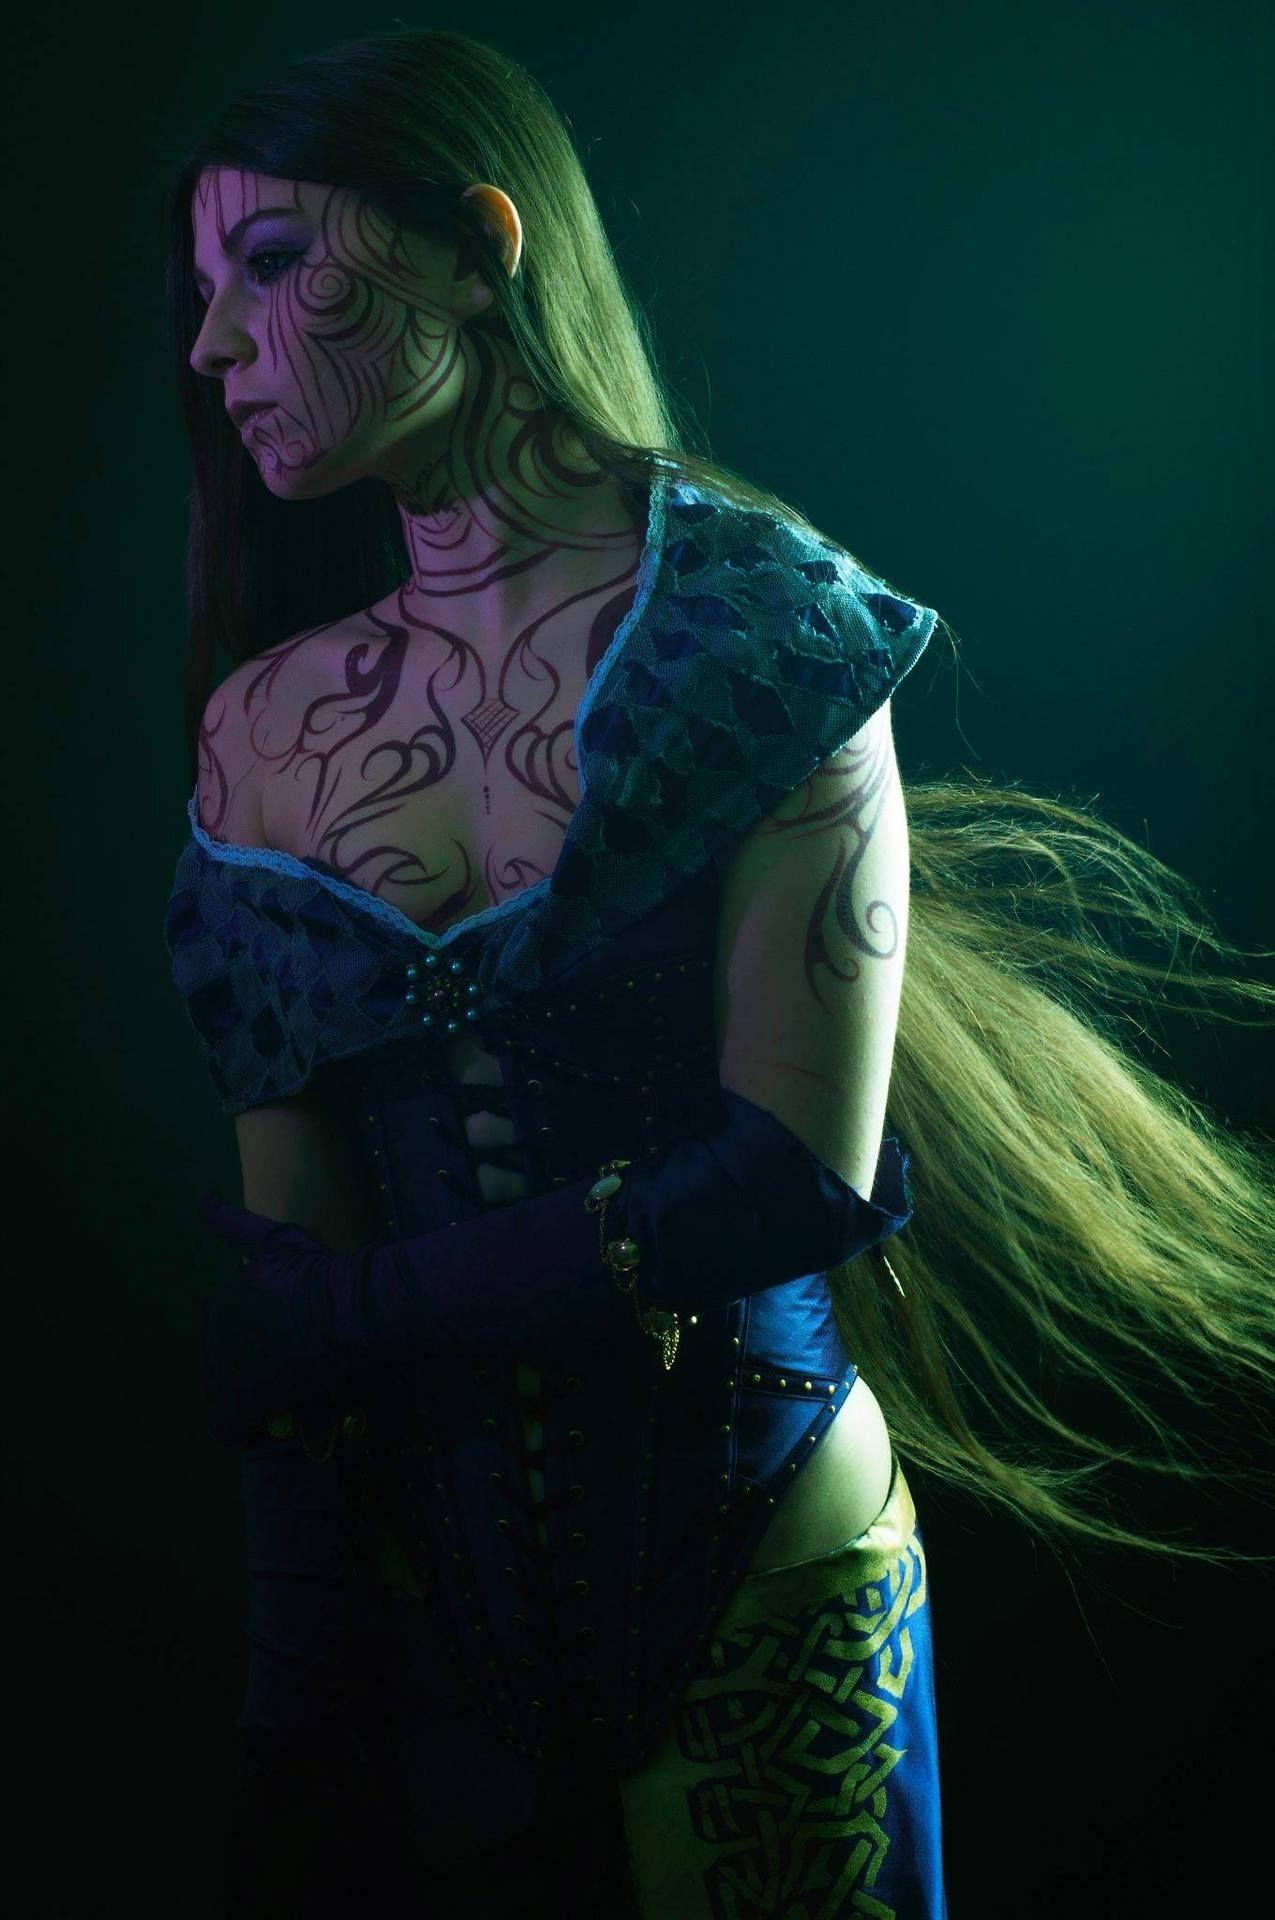 Underworld LARP Cosplay, The gathering, Dark fantasy